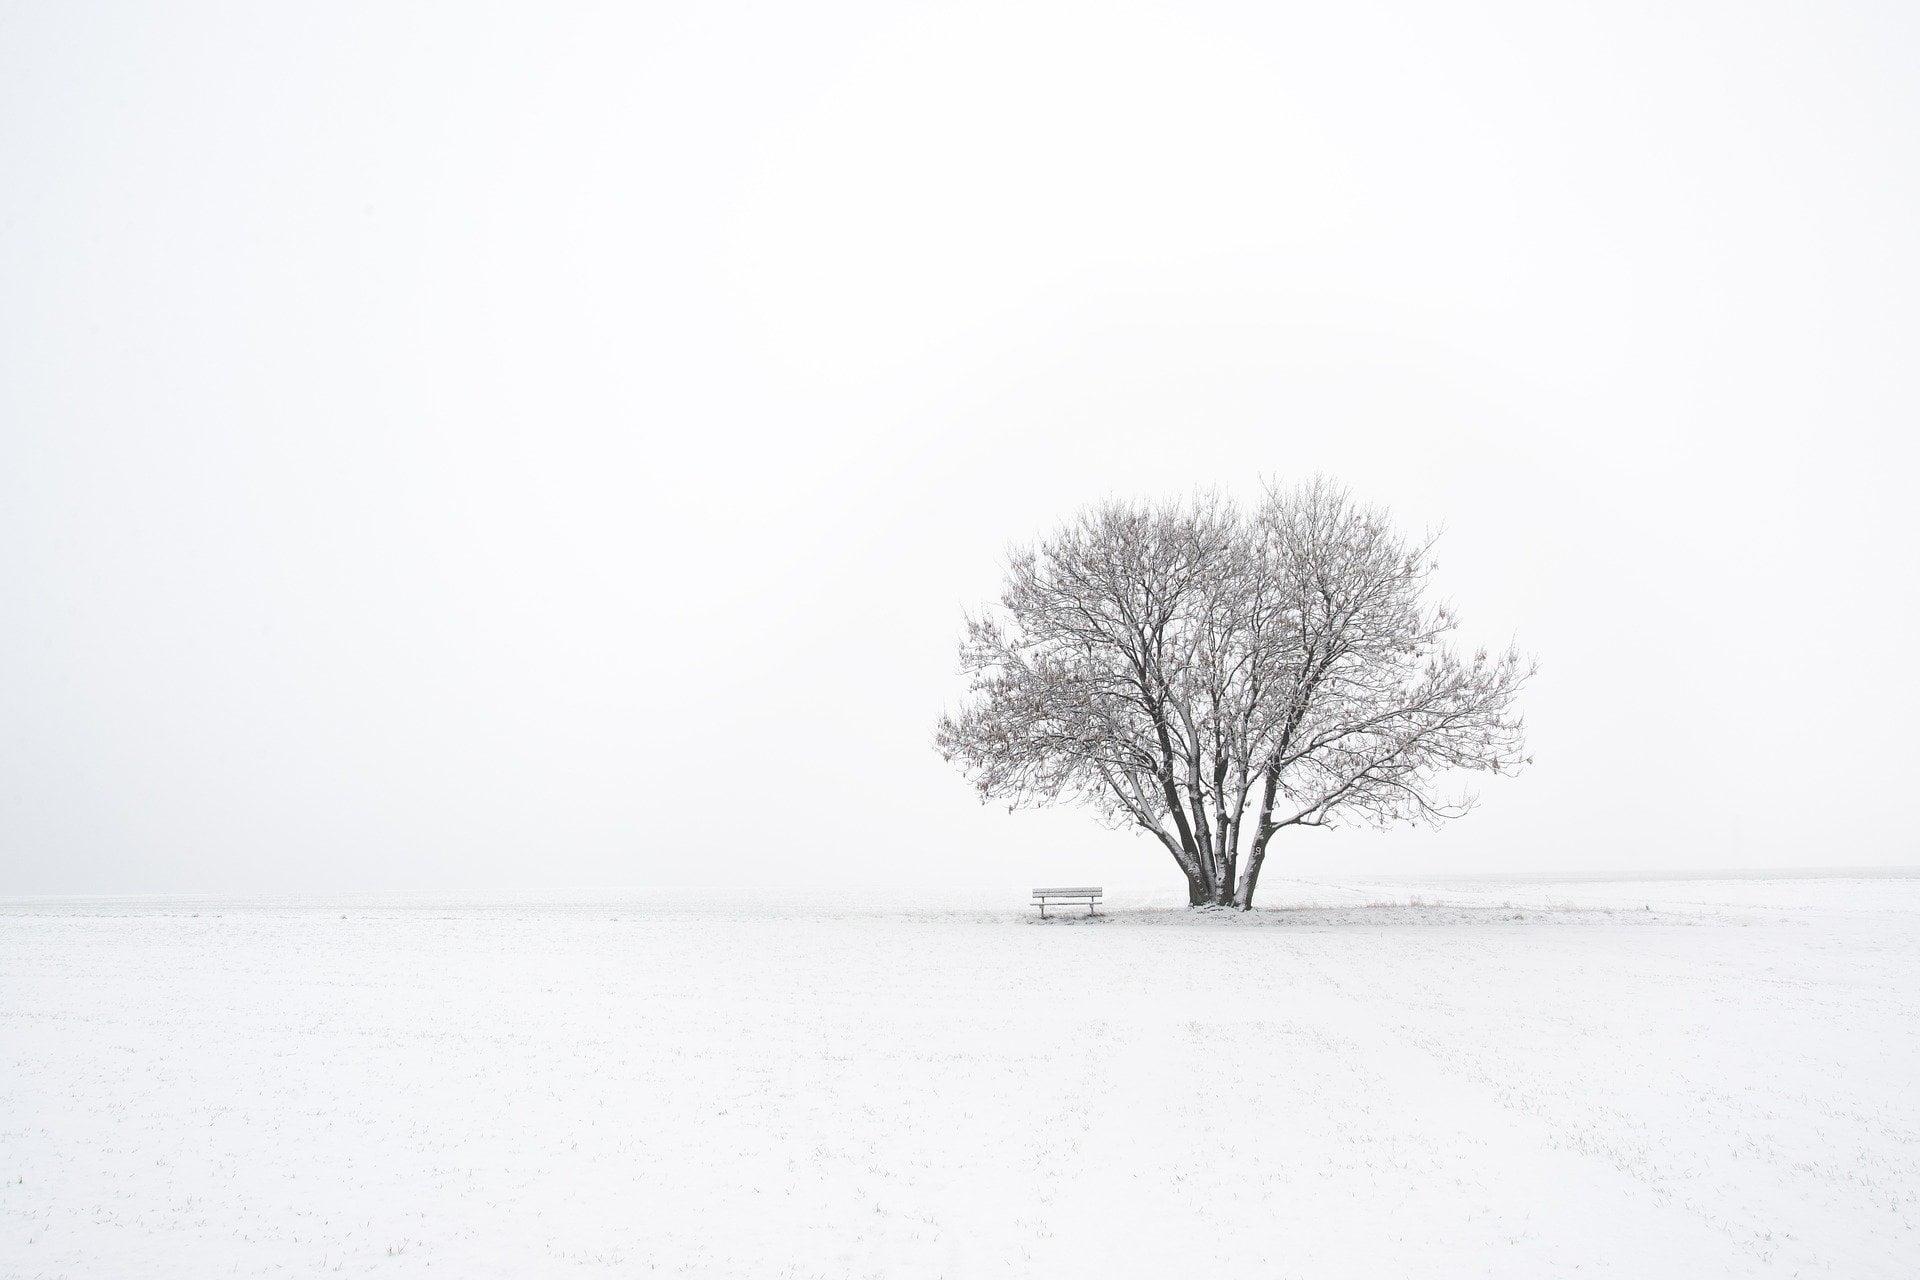 winter-3974511_1920